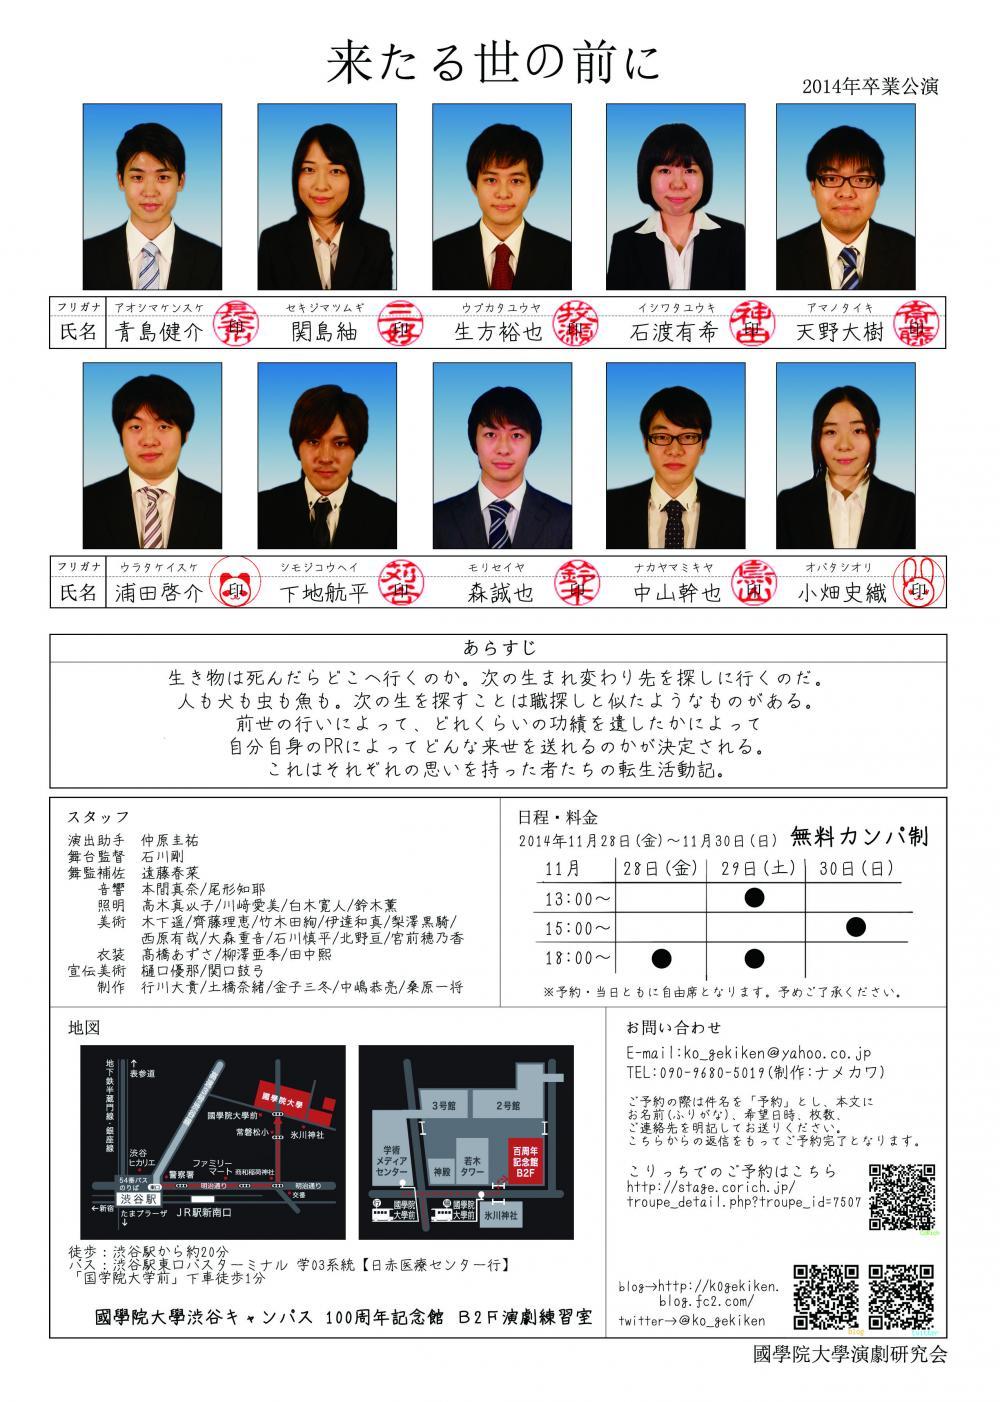 kitaruyo_convert_20141120231147.jpg